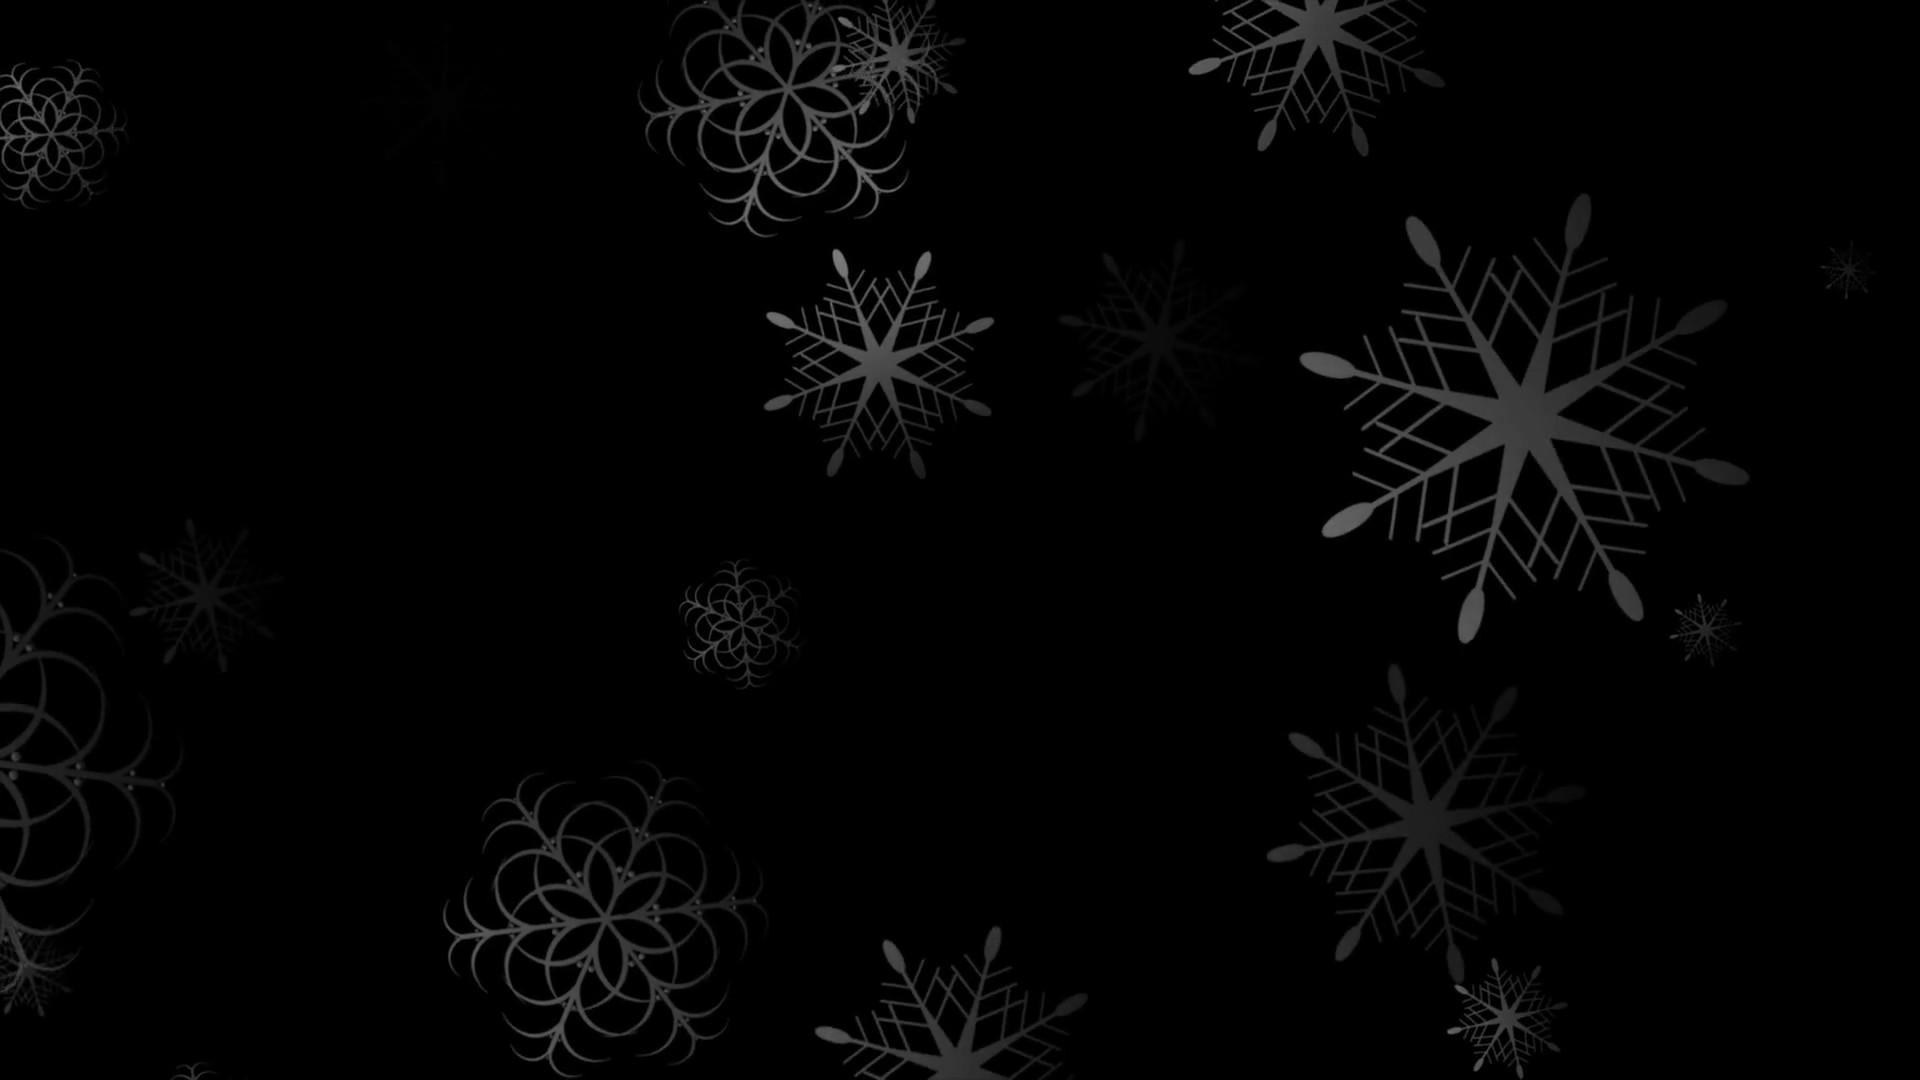 Dark Christmas Wallpaper 63 Images